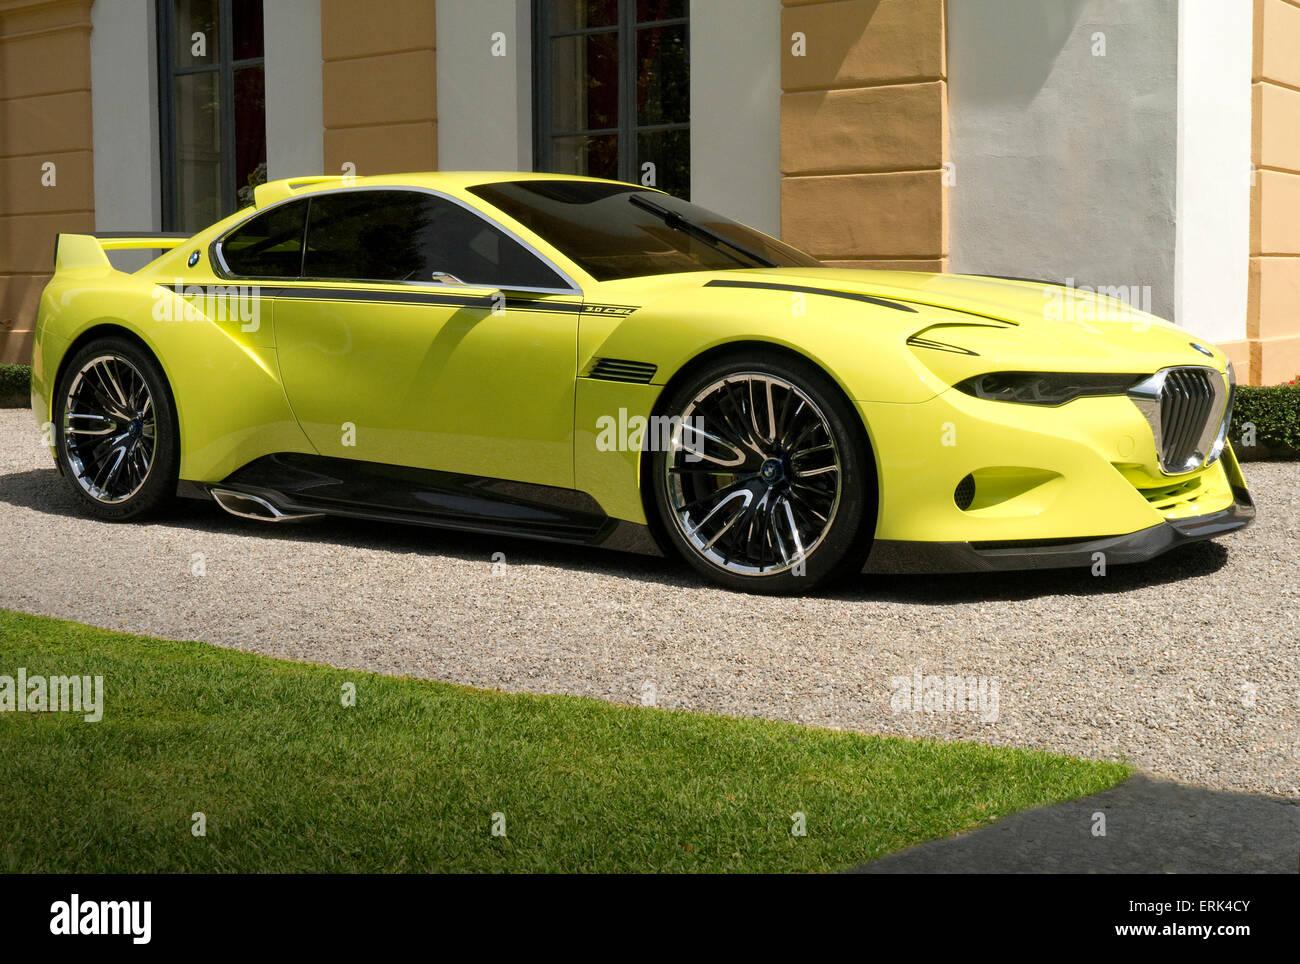 BMW CSI Concept car 2015 - Stock Image